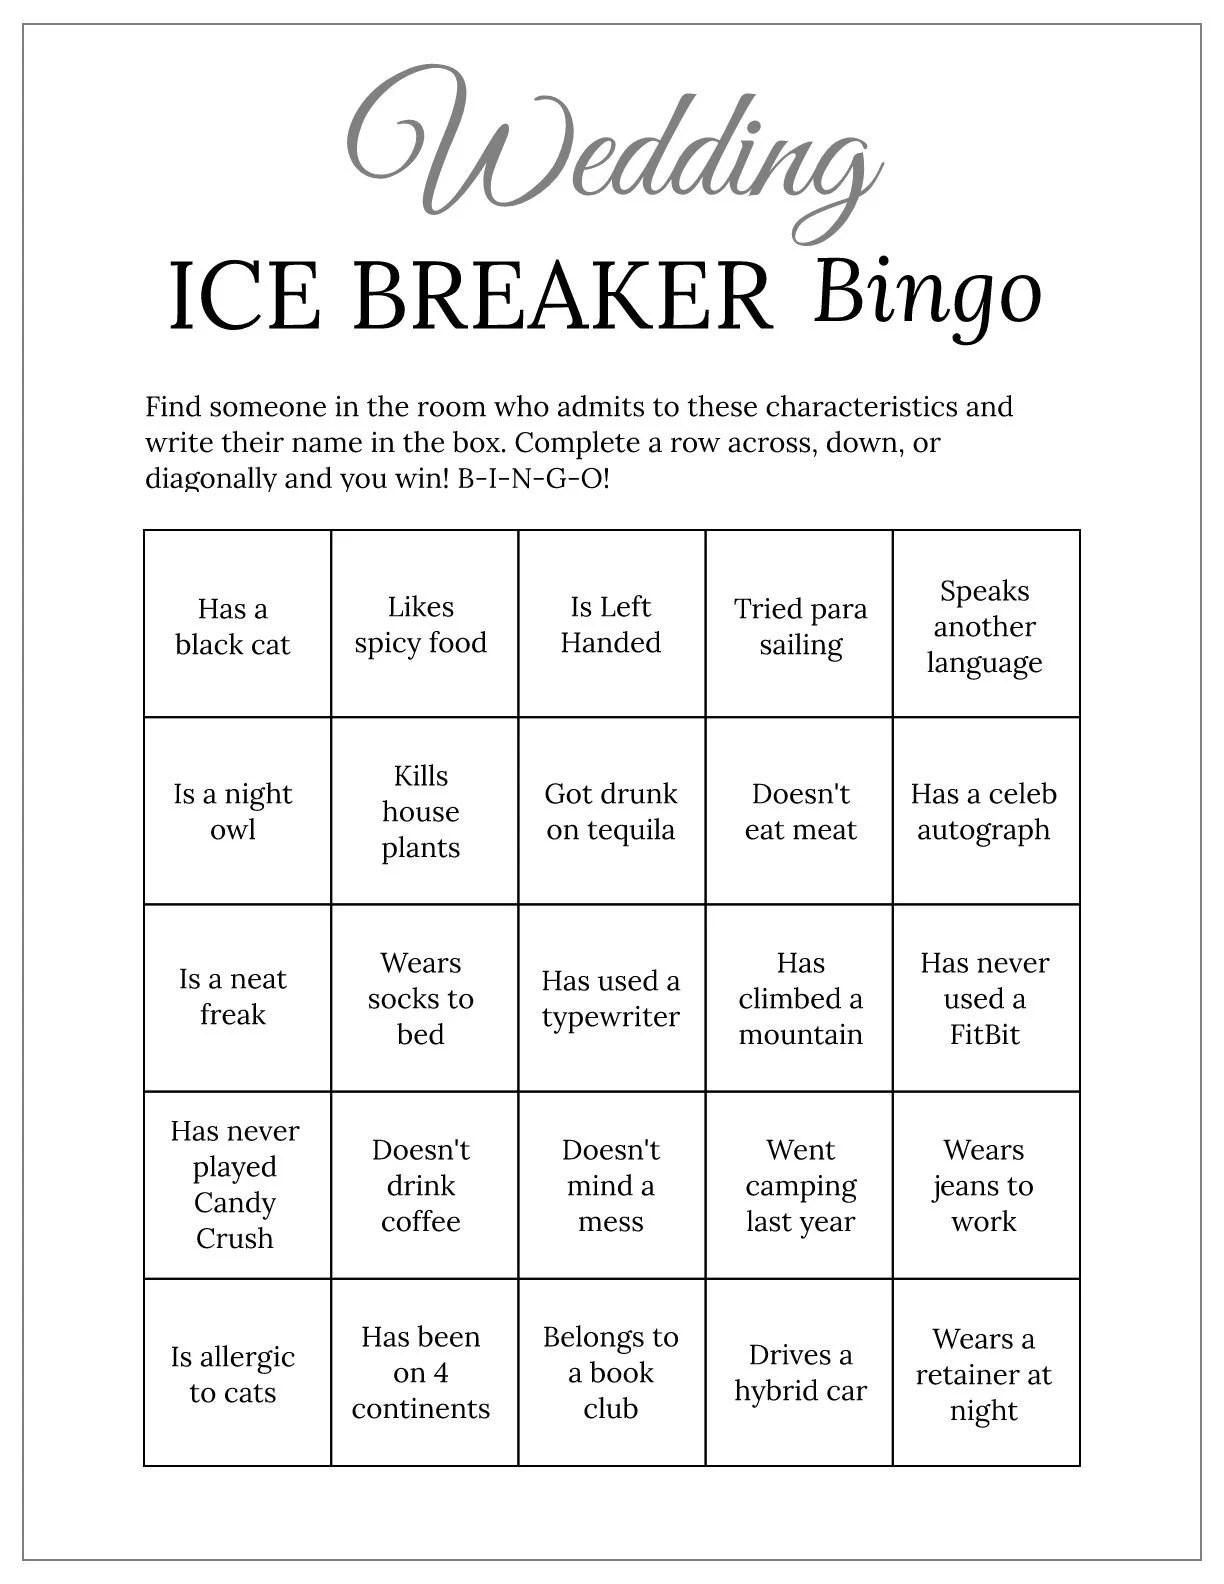 Gray Bridal Shower Wedding Ice Breaker Human Bingo Cards